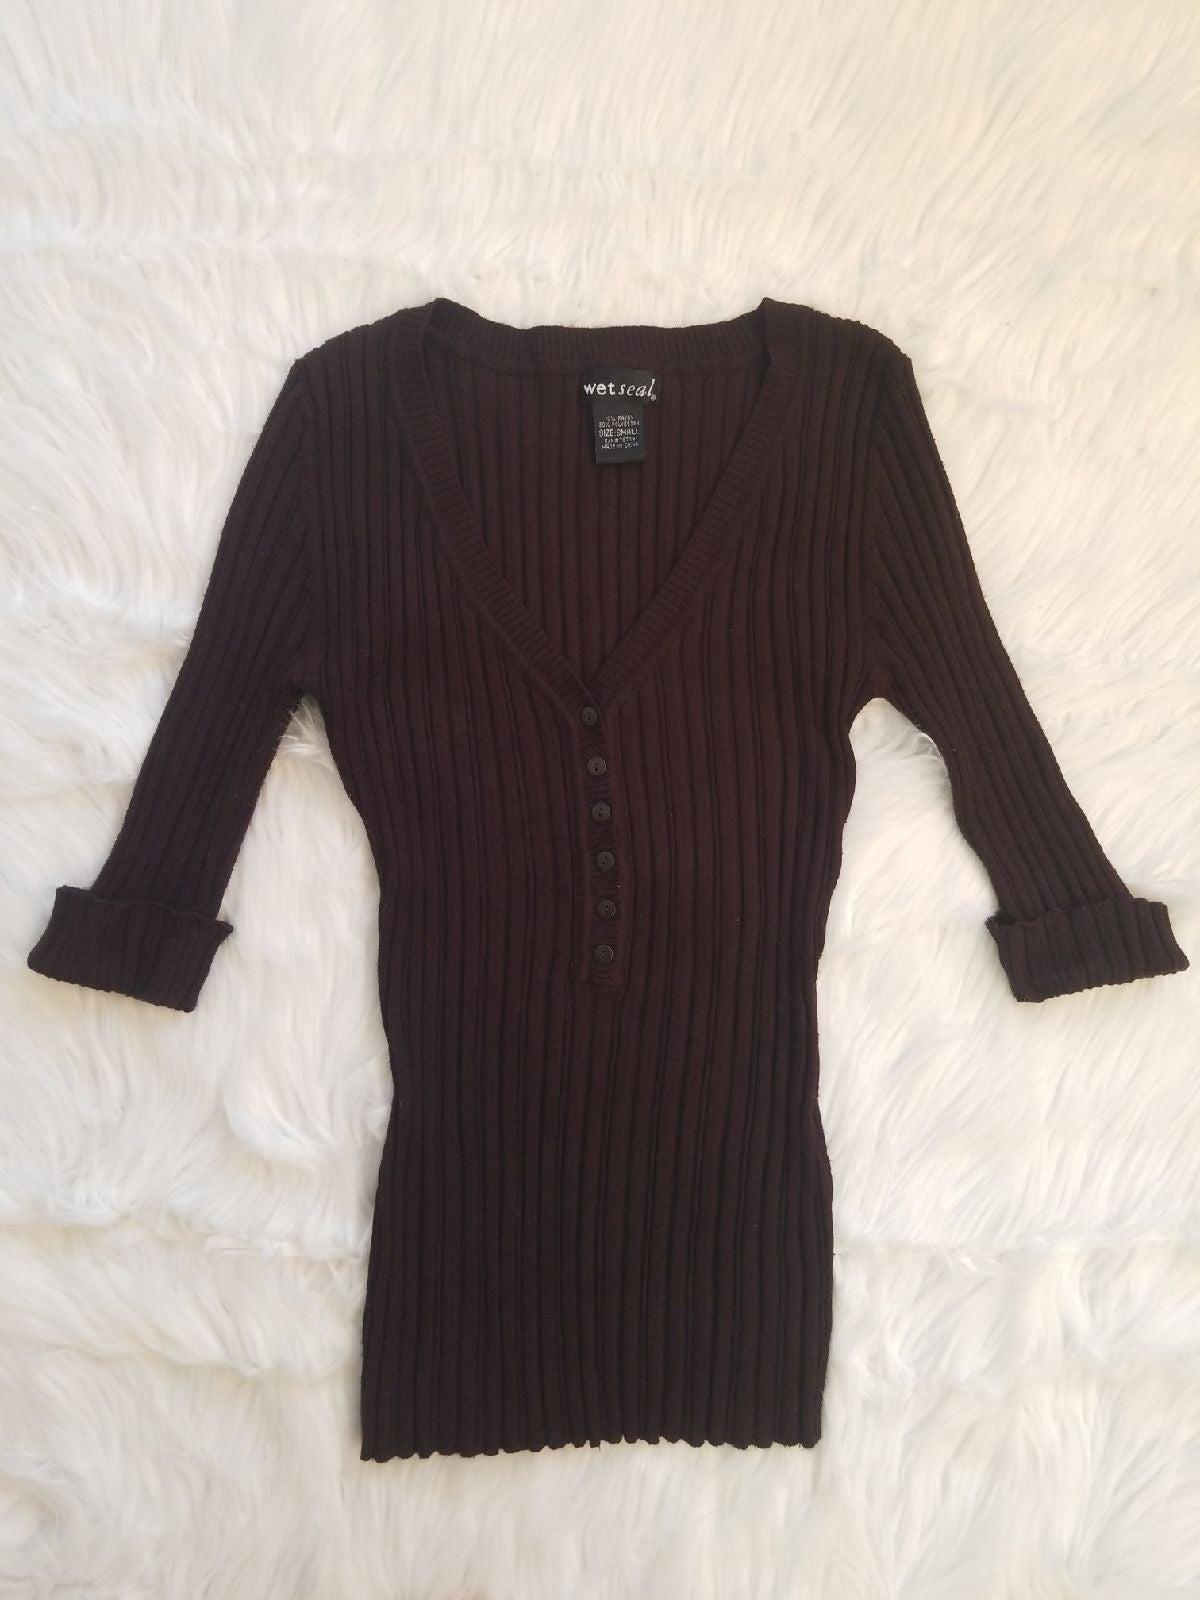 NWOT Super Cute Brown, Ribbed Sweater